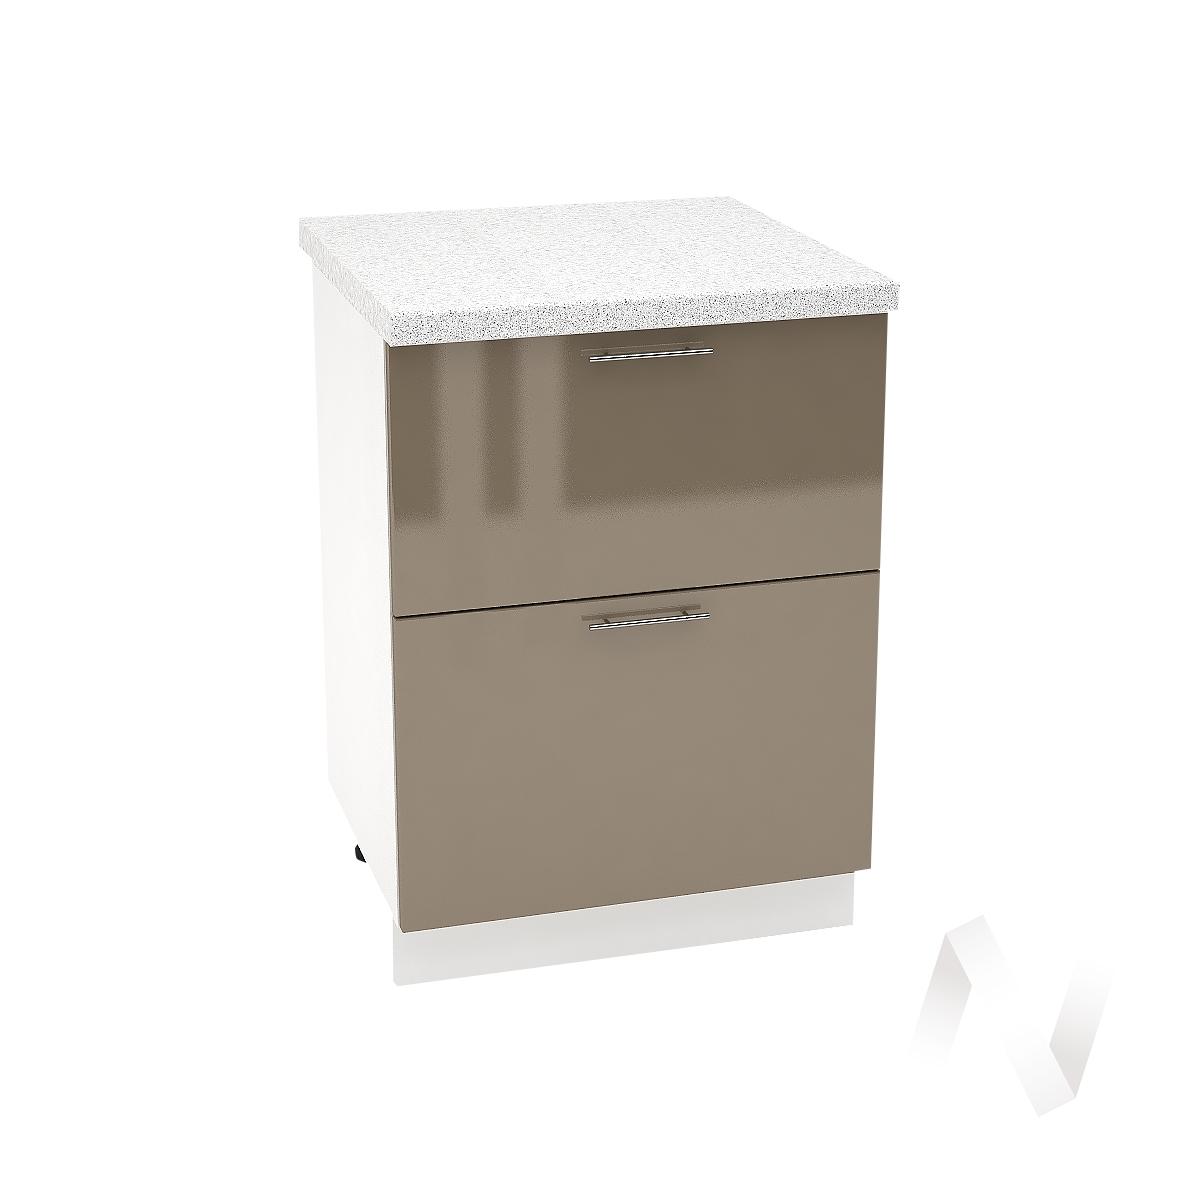 "Кухня ""Валерия-М"": Шкаф нижний с 2-мя ящиками 600, ШН2Я 600 (Капучино глянец/корпус белый)"